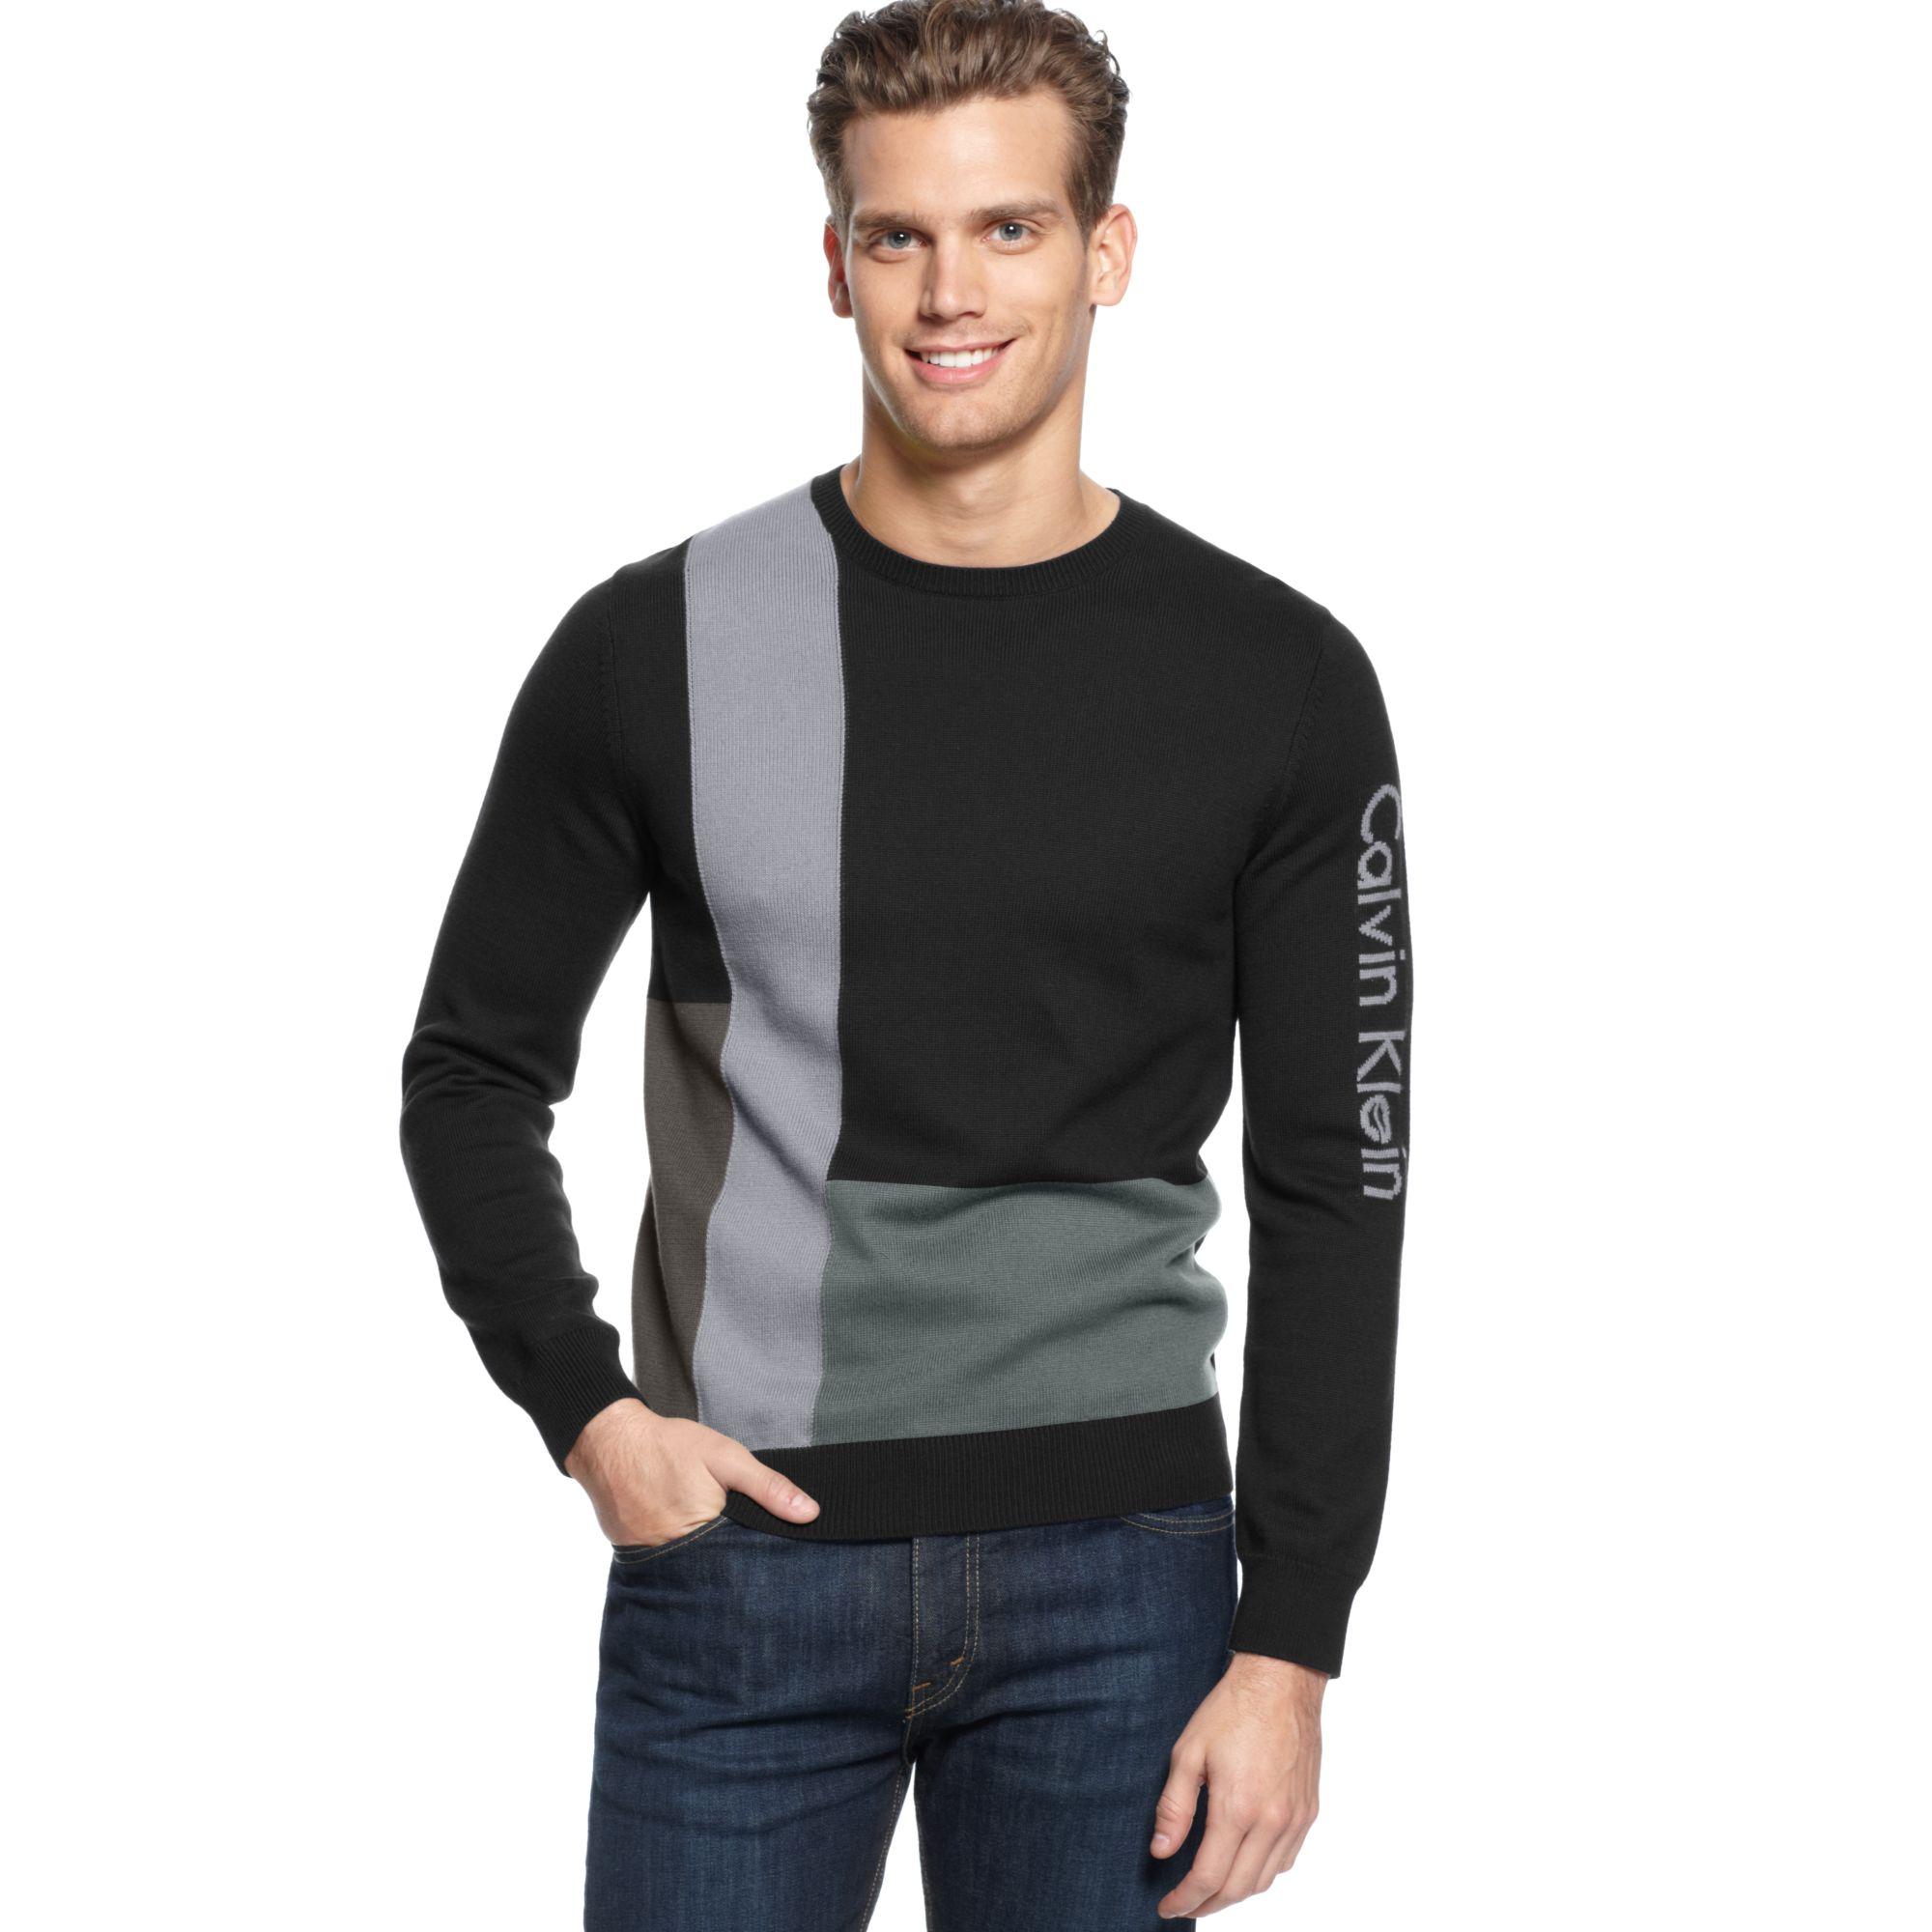 0d33251c1121 Lyst - Calvin Klein Colorblock Intarsia Sweater in Black for Men